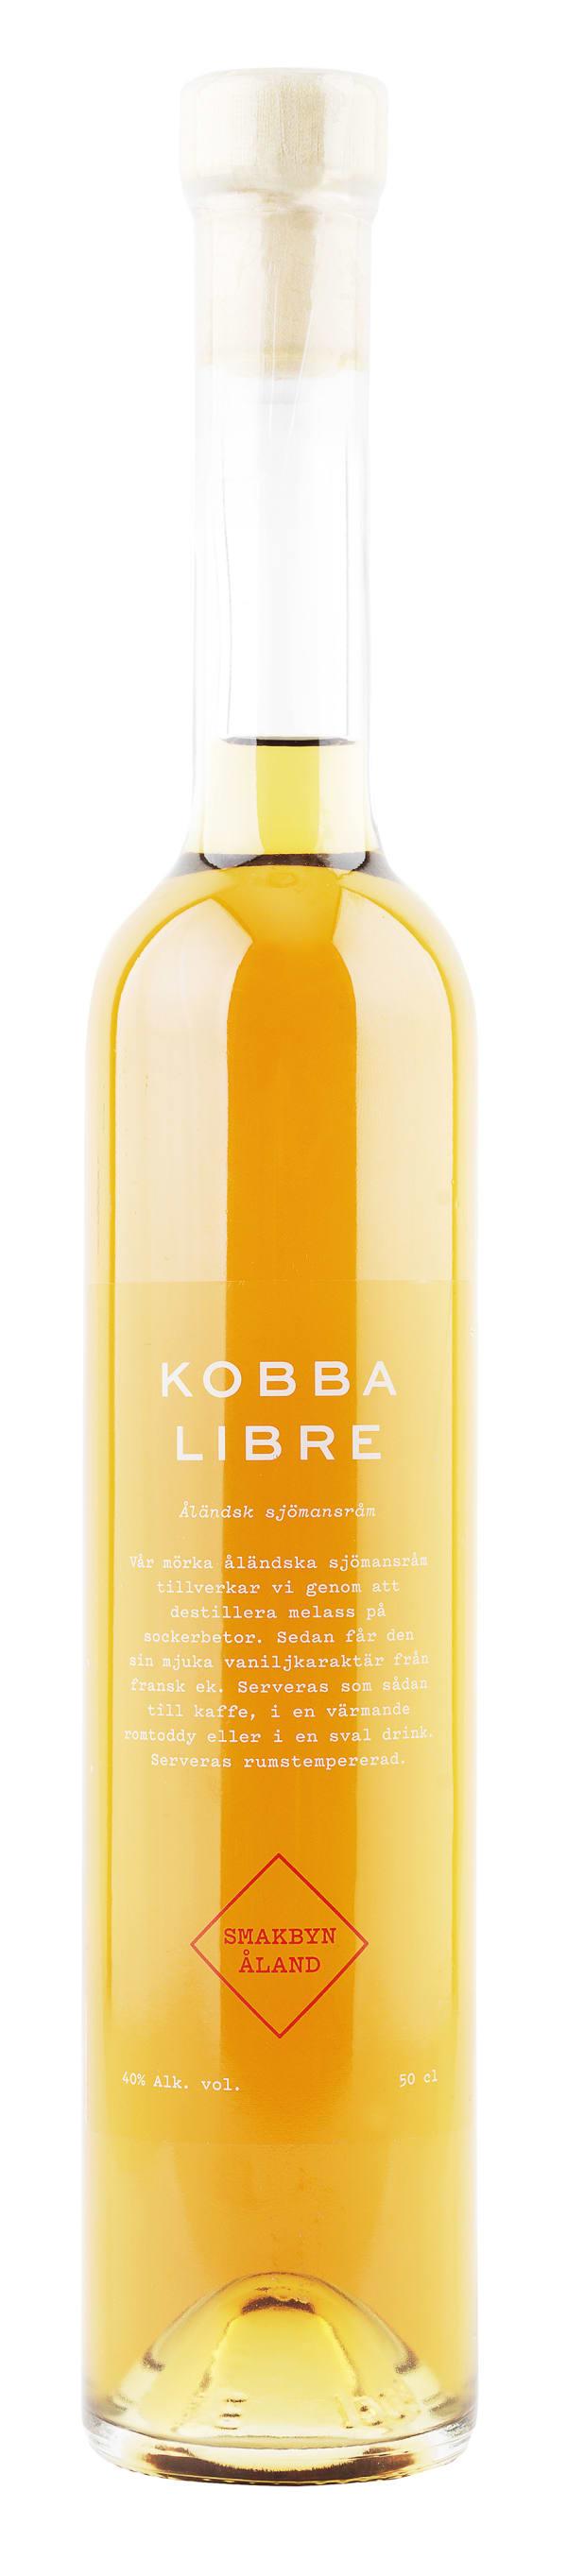 Smakbyns Kobba Libre